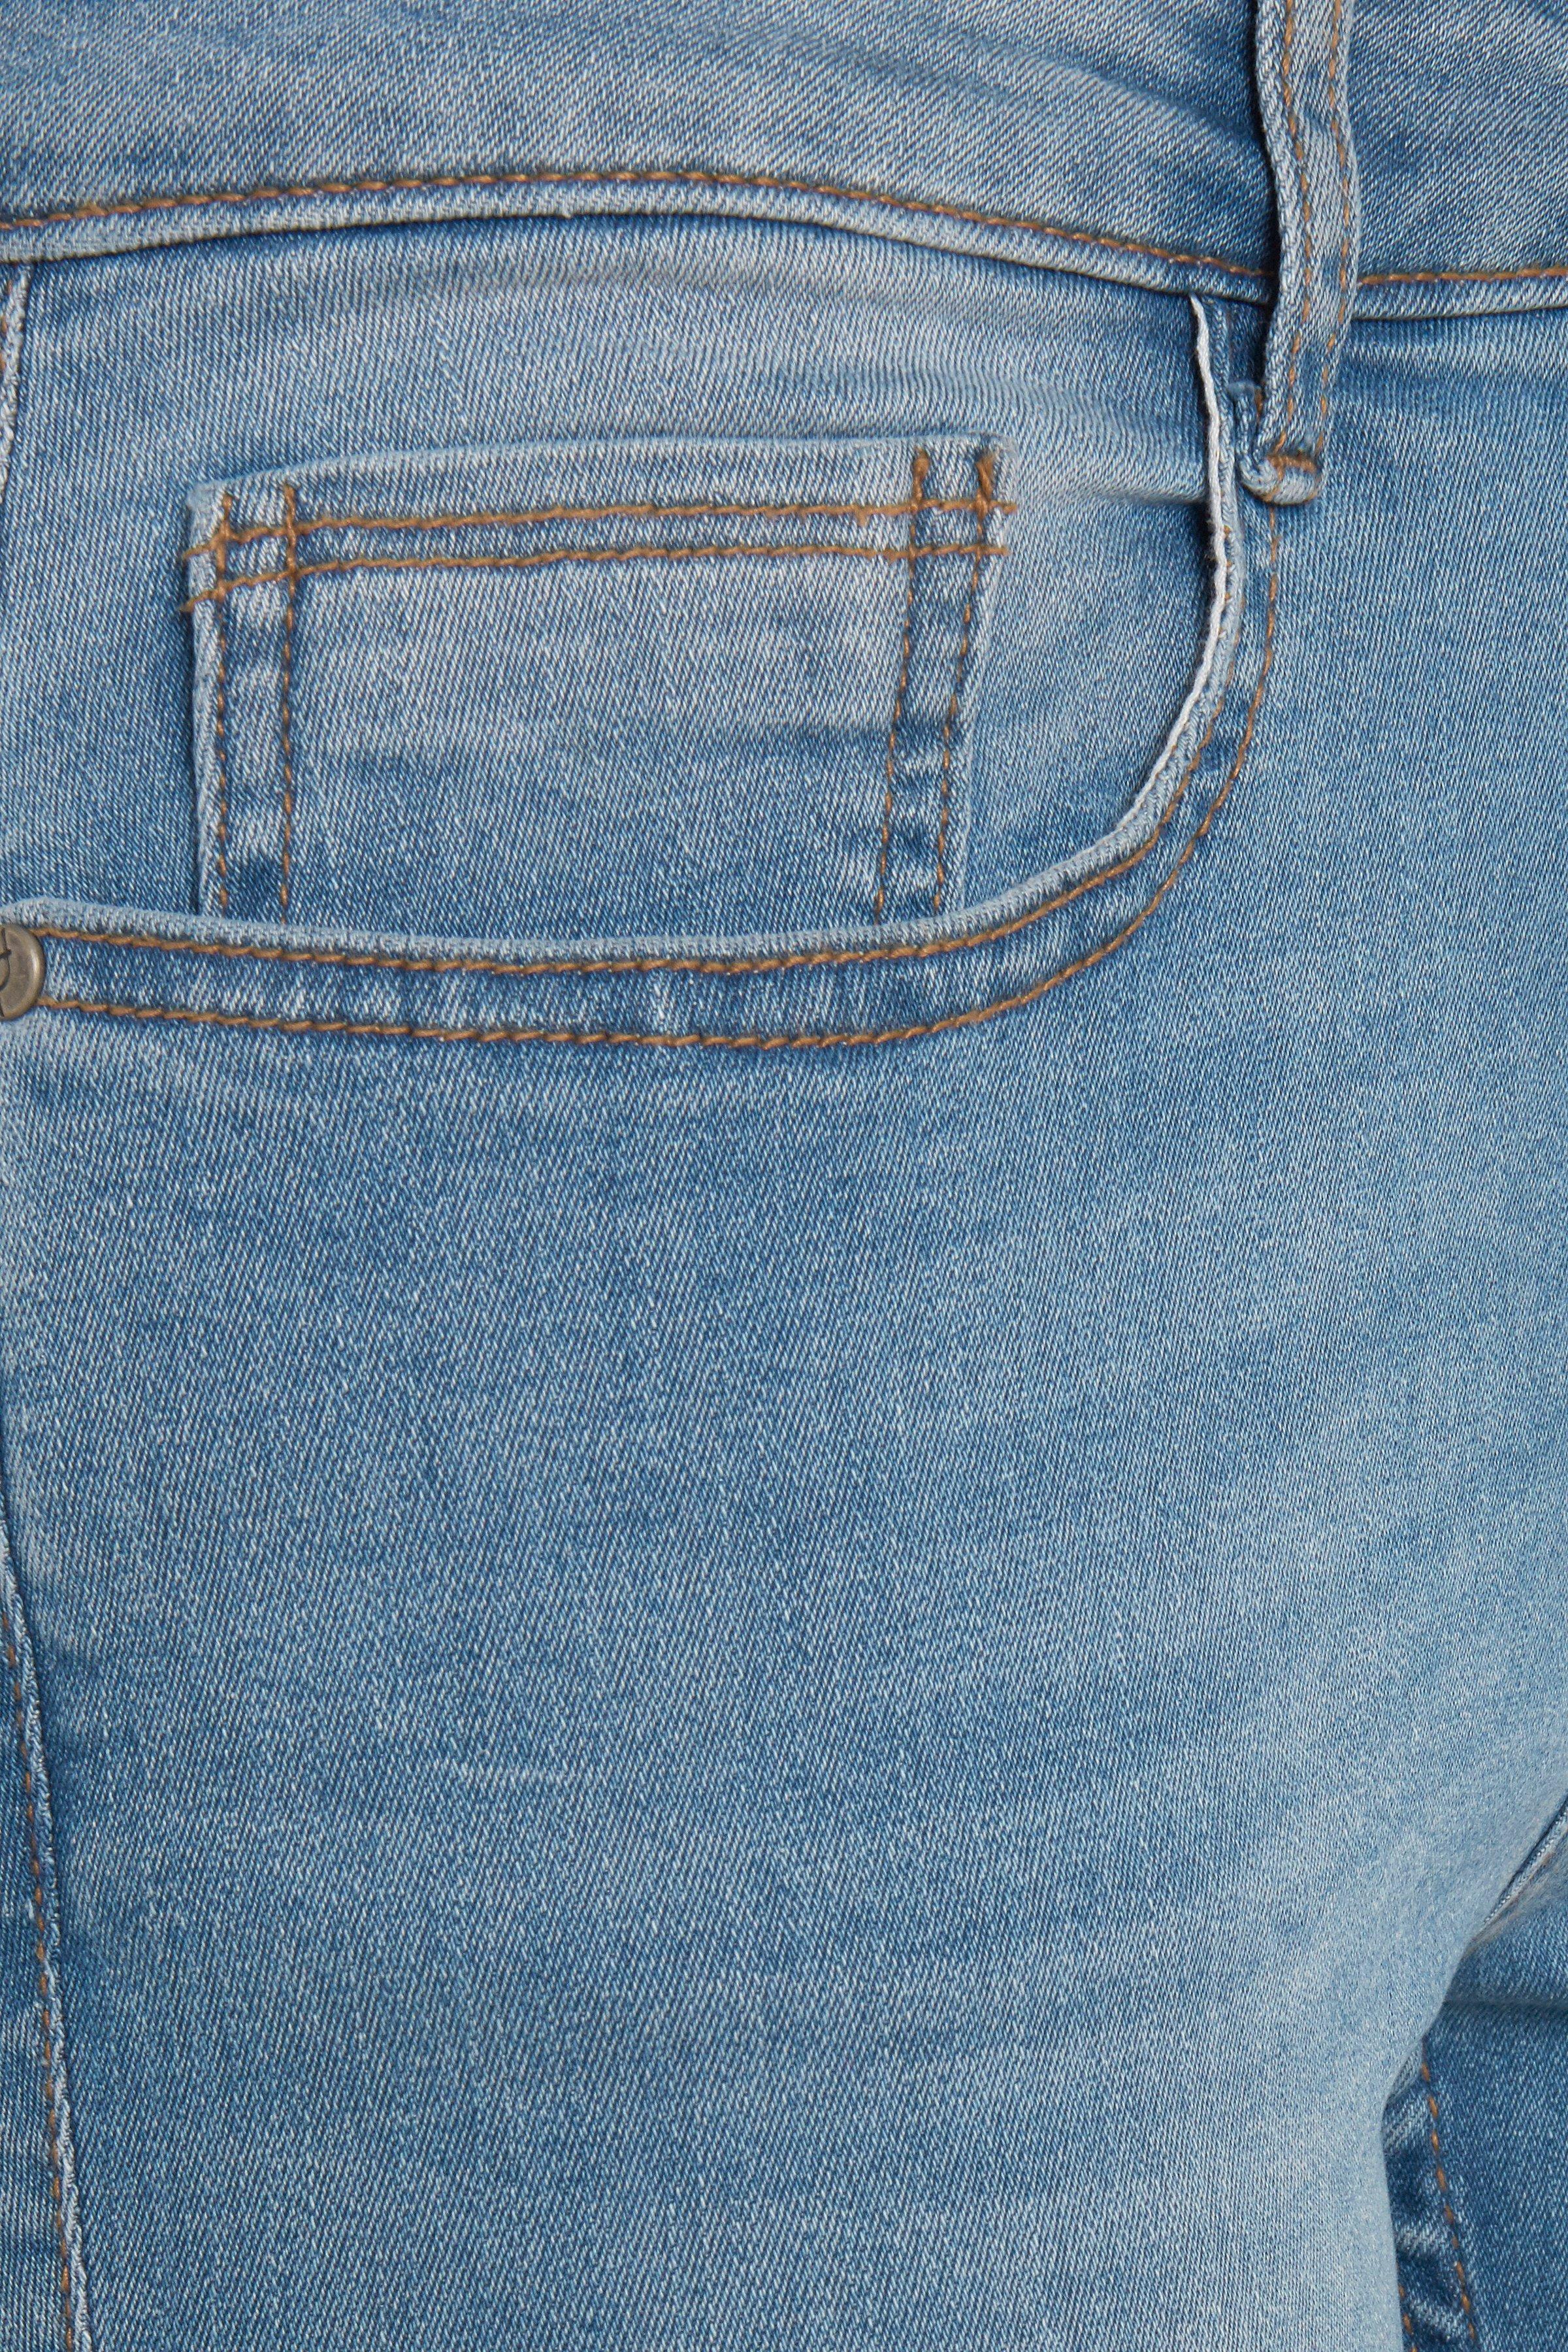 Hell denimblau Denimhose von Fransa – Shoppen Sie Hell denimblau Denimhose ab Gr. 34-46 hier